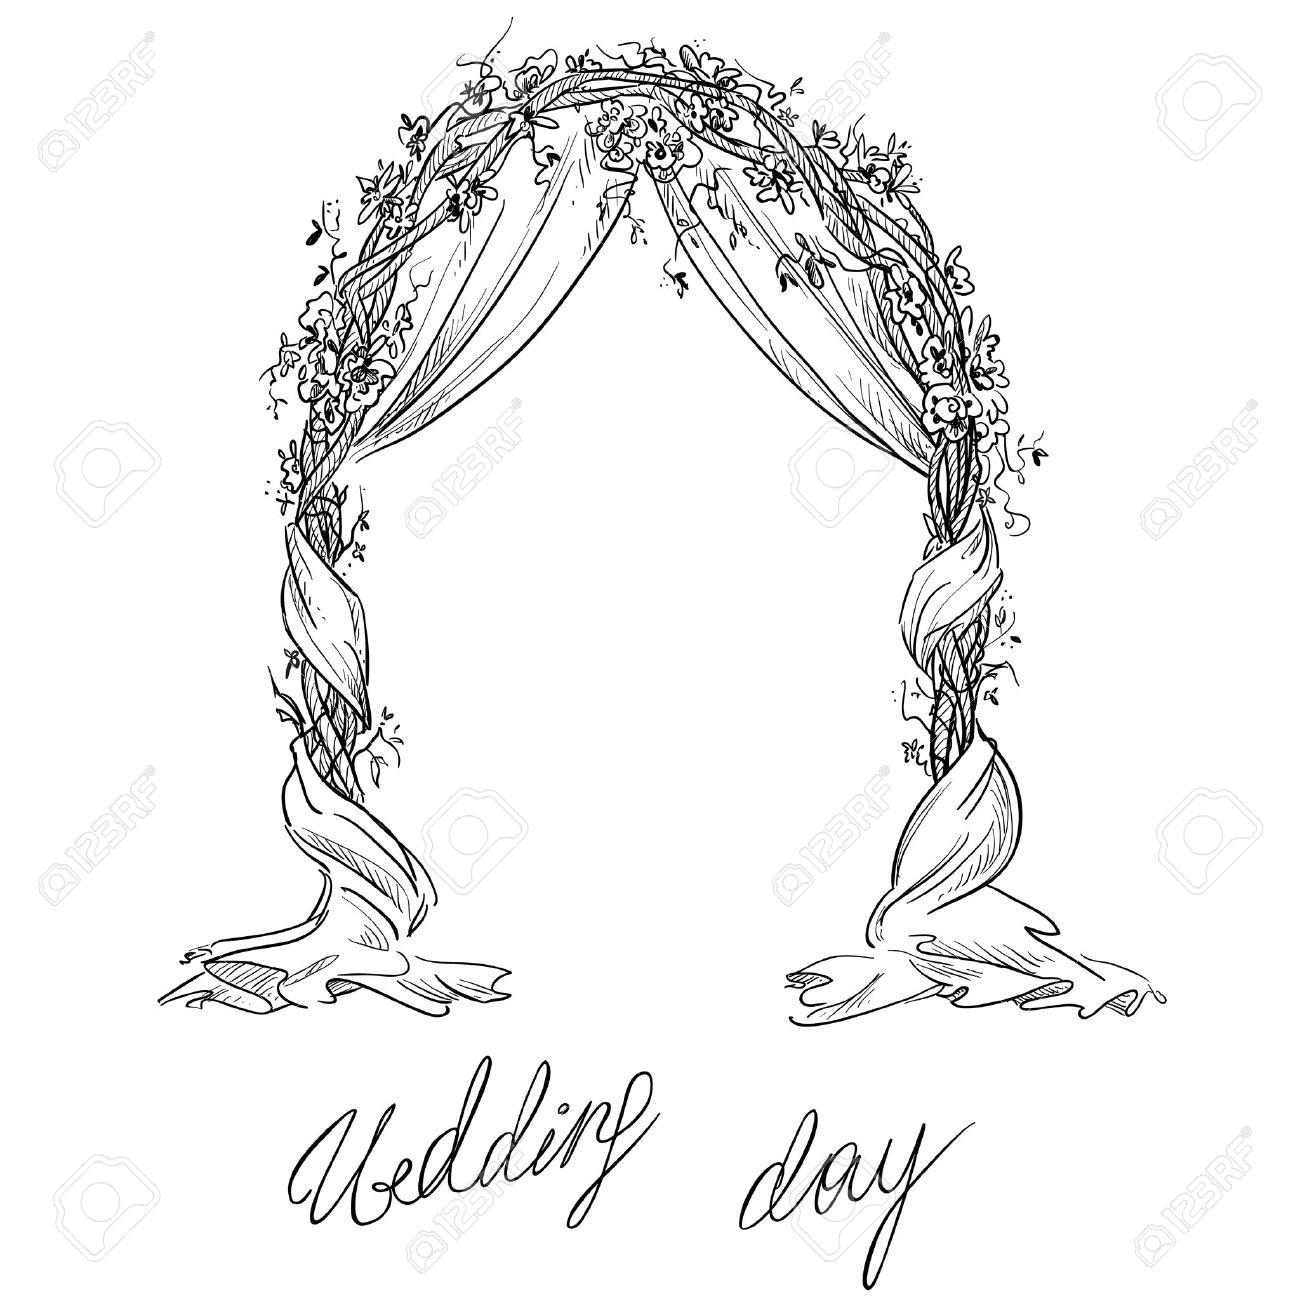 wedding arch decoration vector sketch design element stock vector 43231219